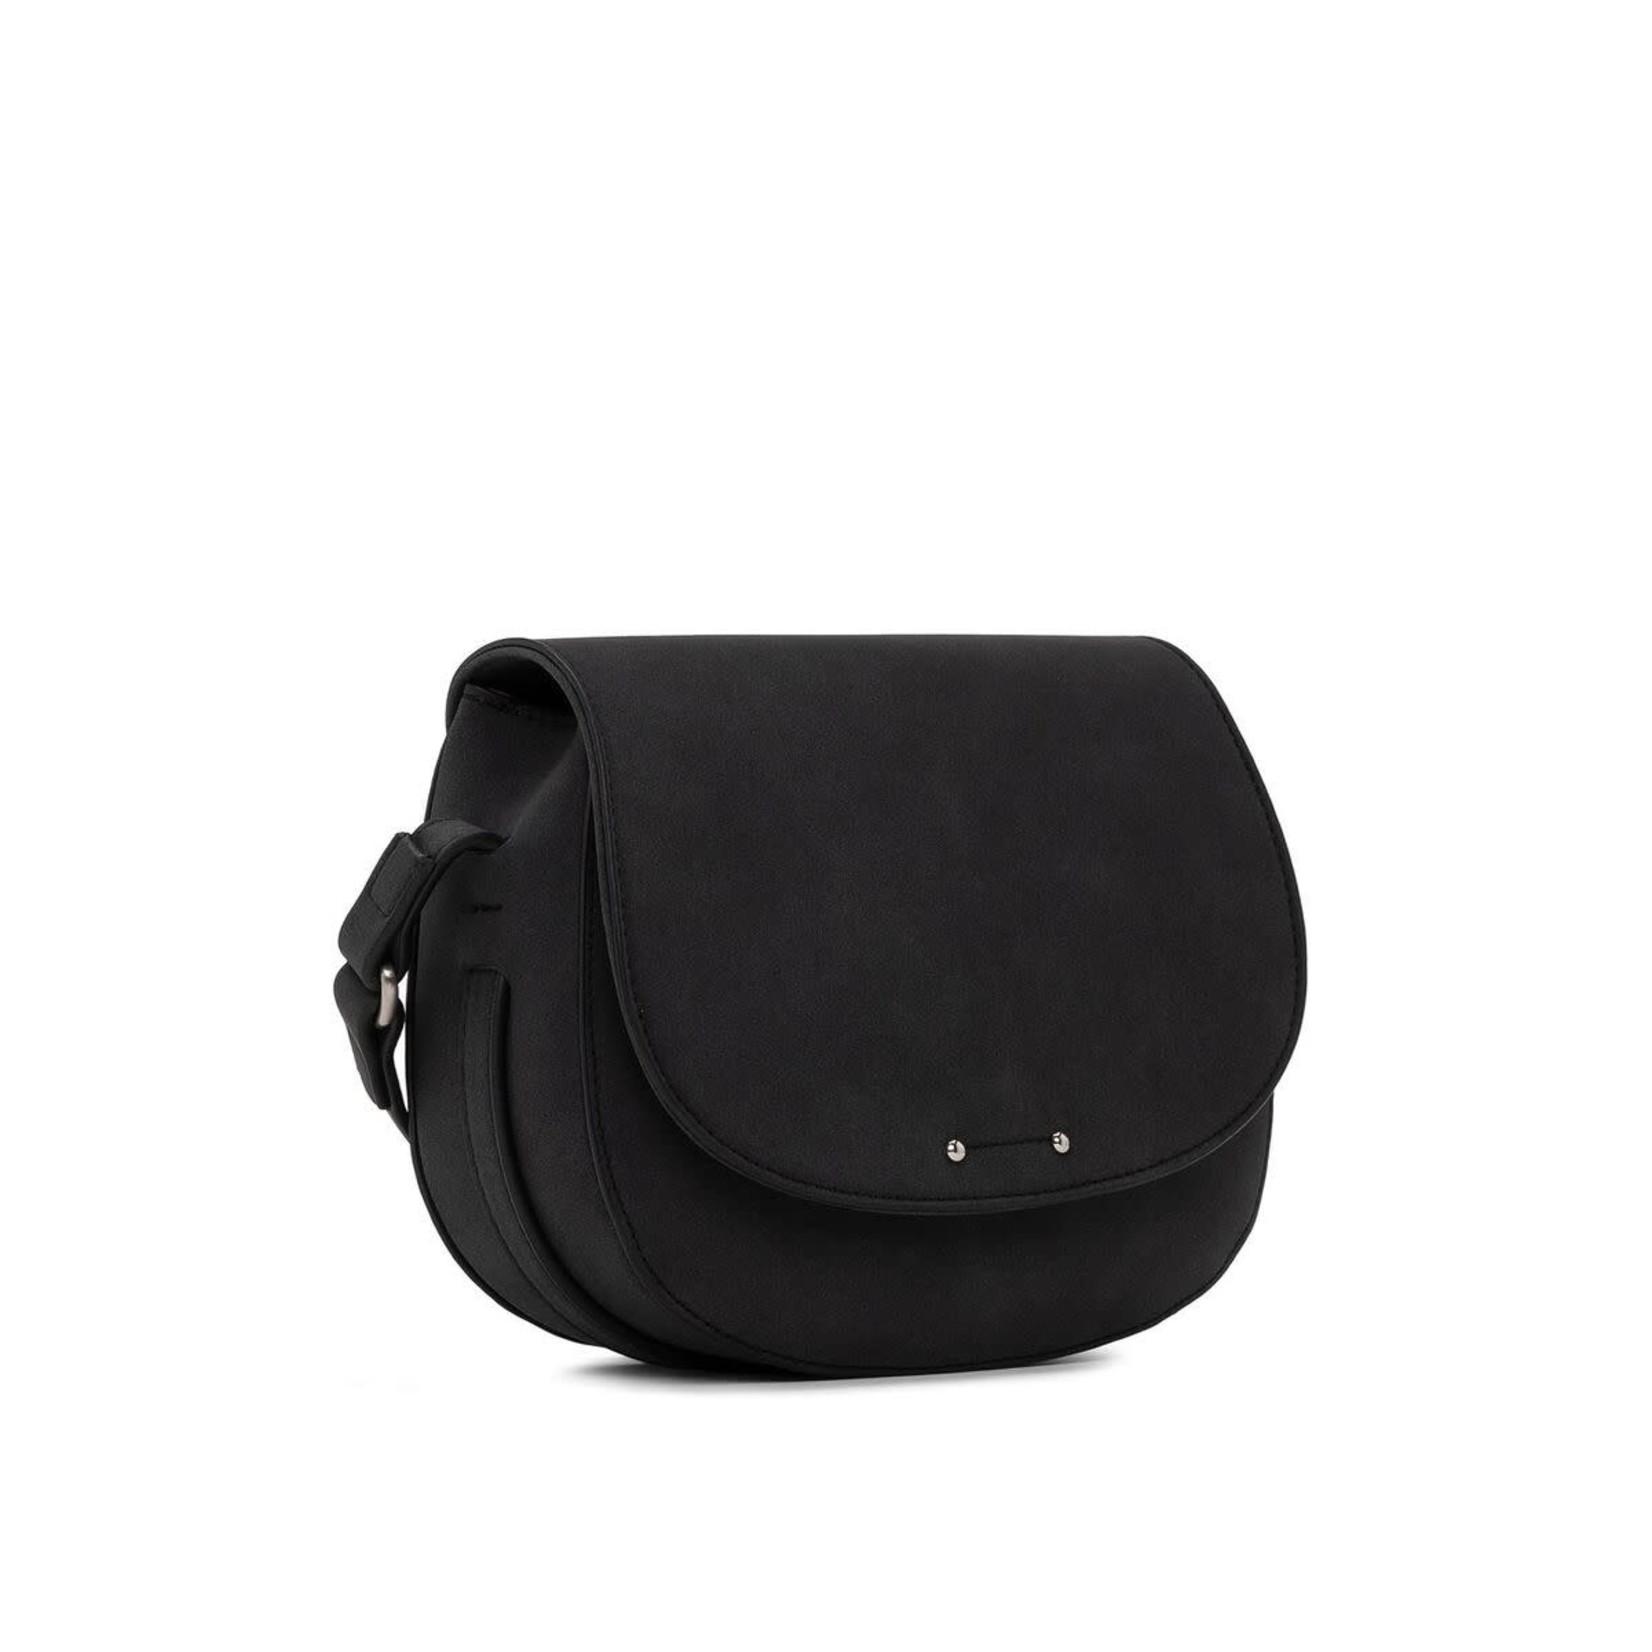 Co-lab Co-lab sac saddle noir